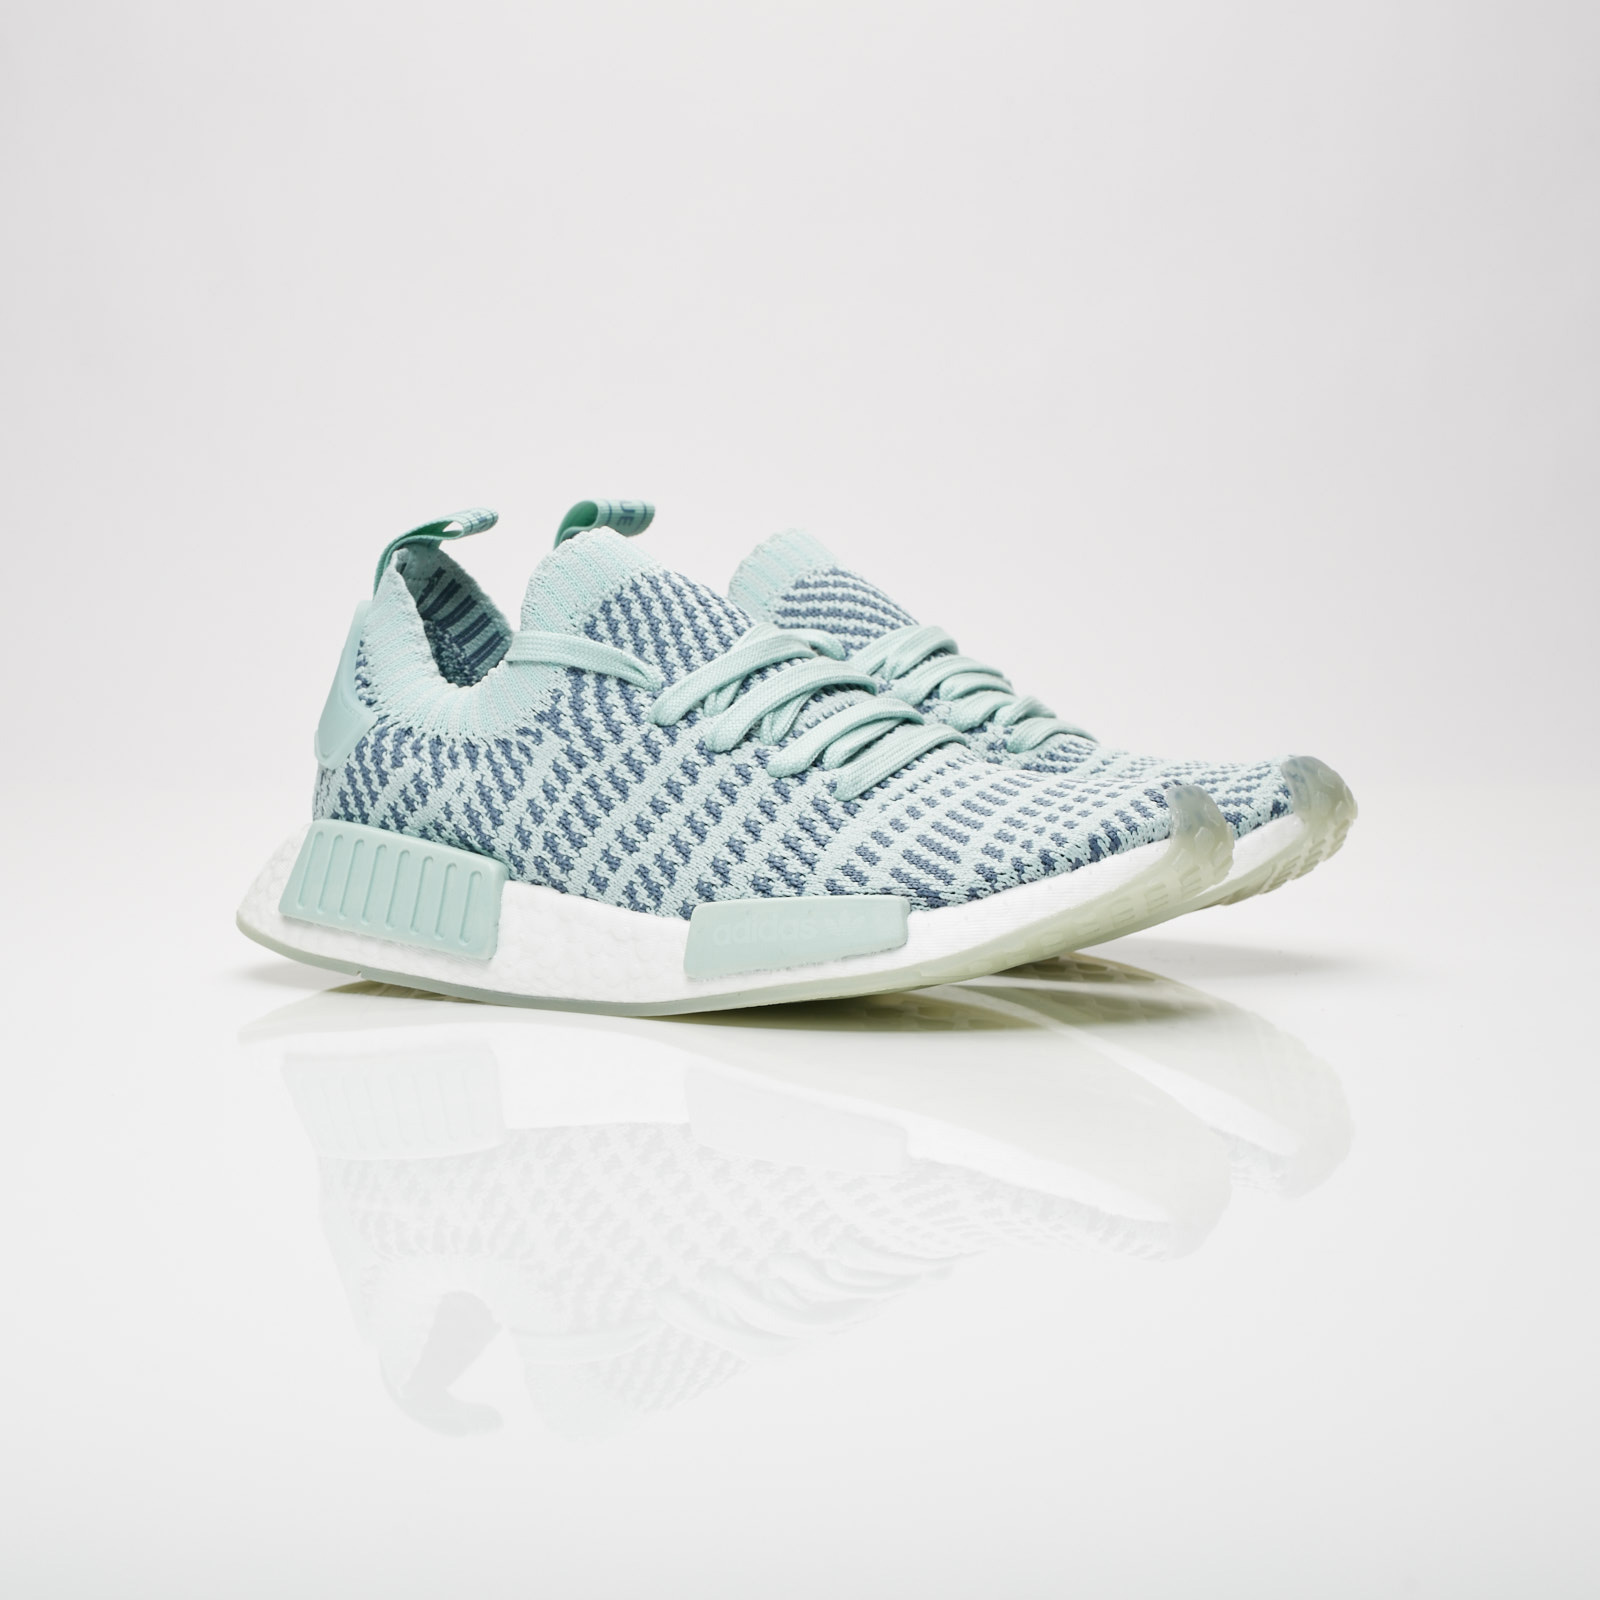 73051e761ac42 adidas NMD R1 Stlt PK W - Cq2031 - Sneakersnstuff